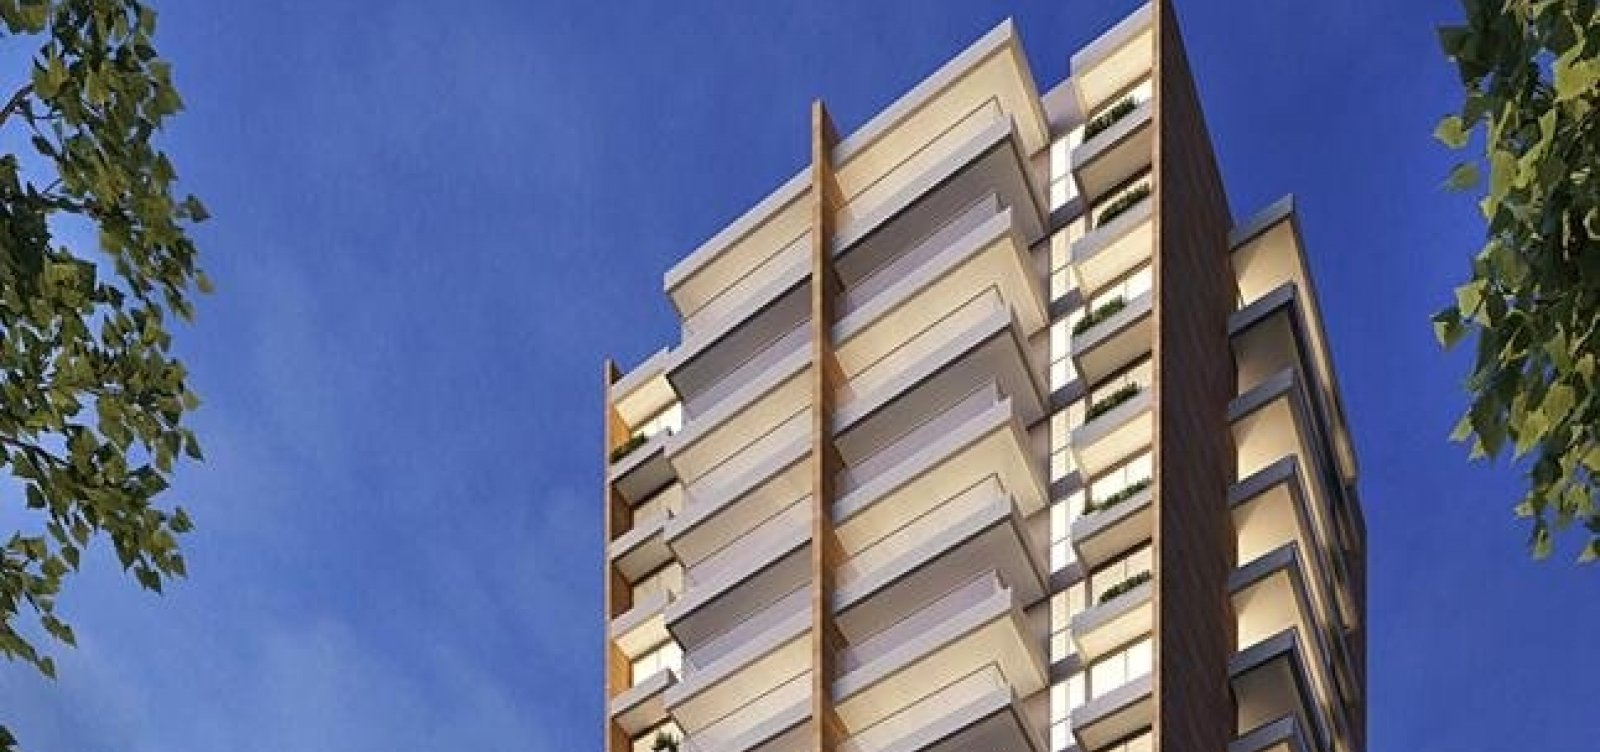 [Caixa concede o primeiro selo casa azul a empreendimento imobiliário na Bahia]